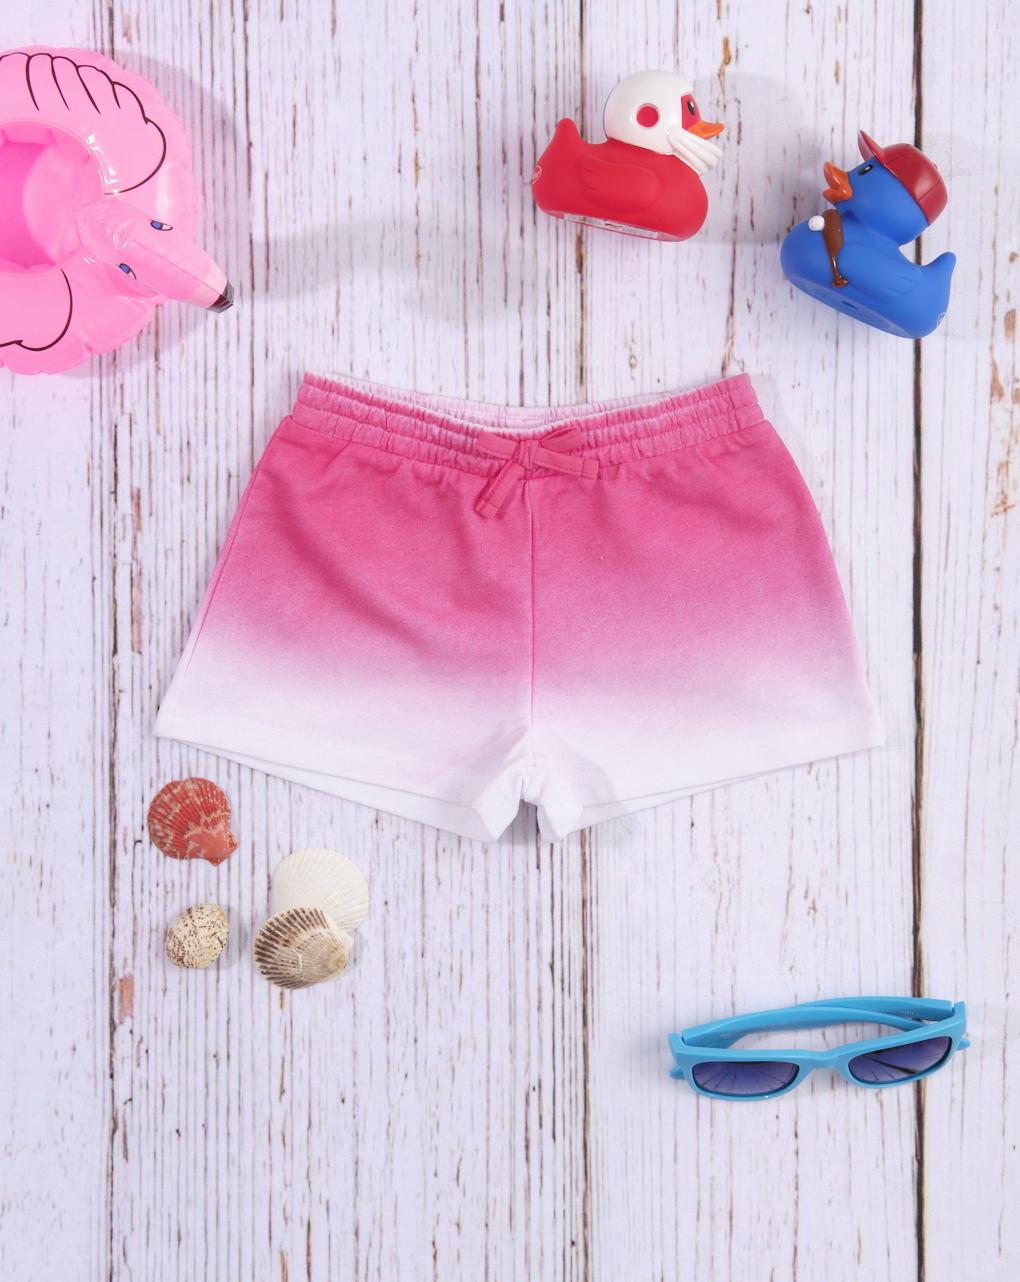 Shorts de jersey rosa / branco com efeito gradiente - Prénatal